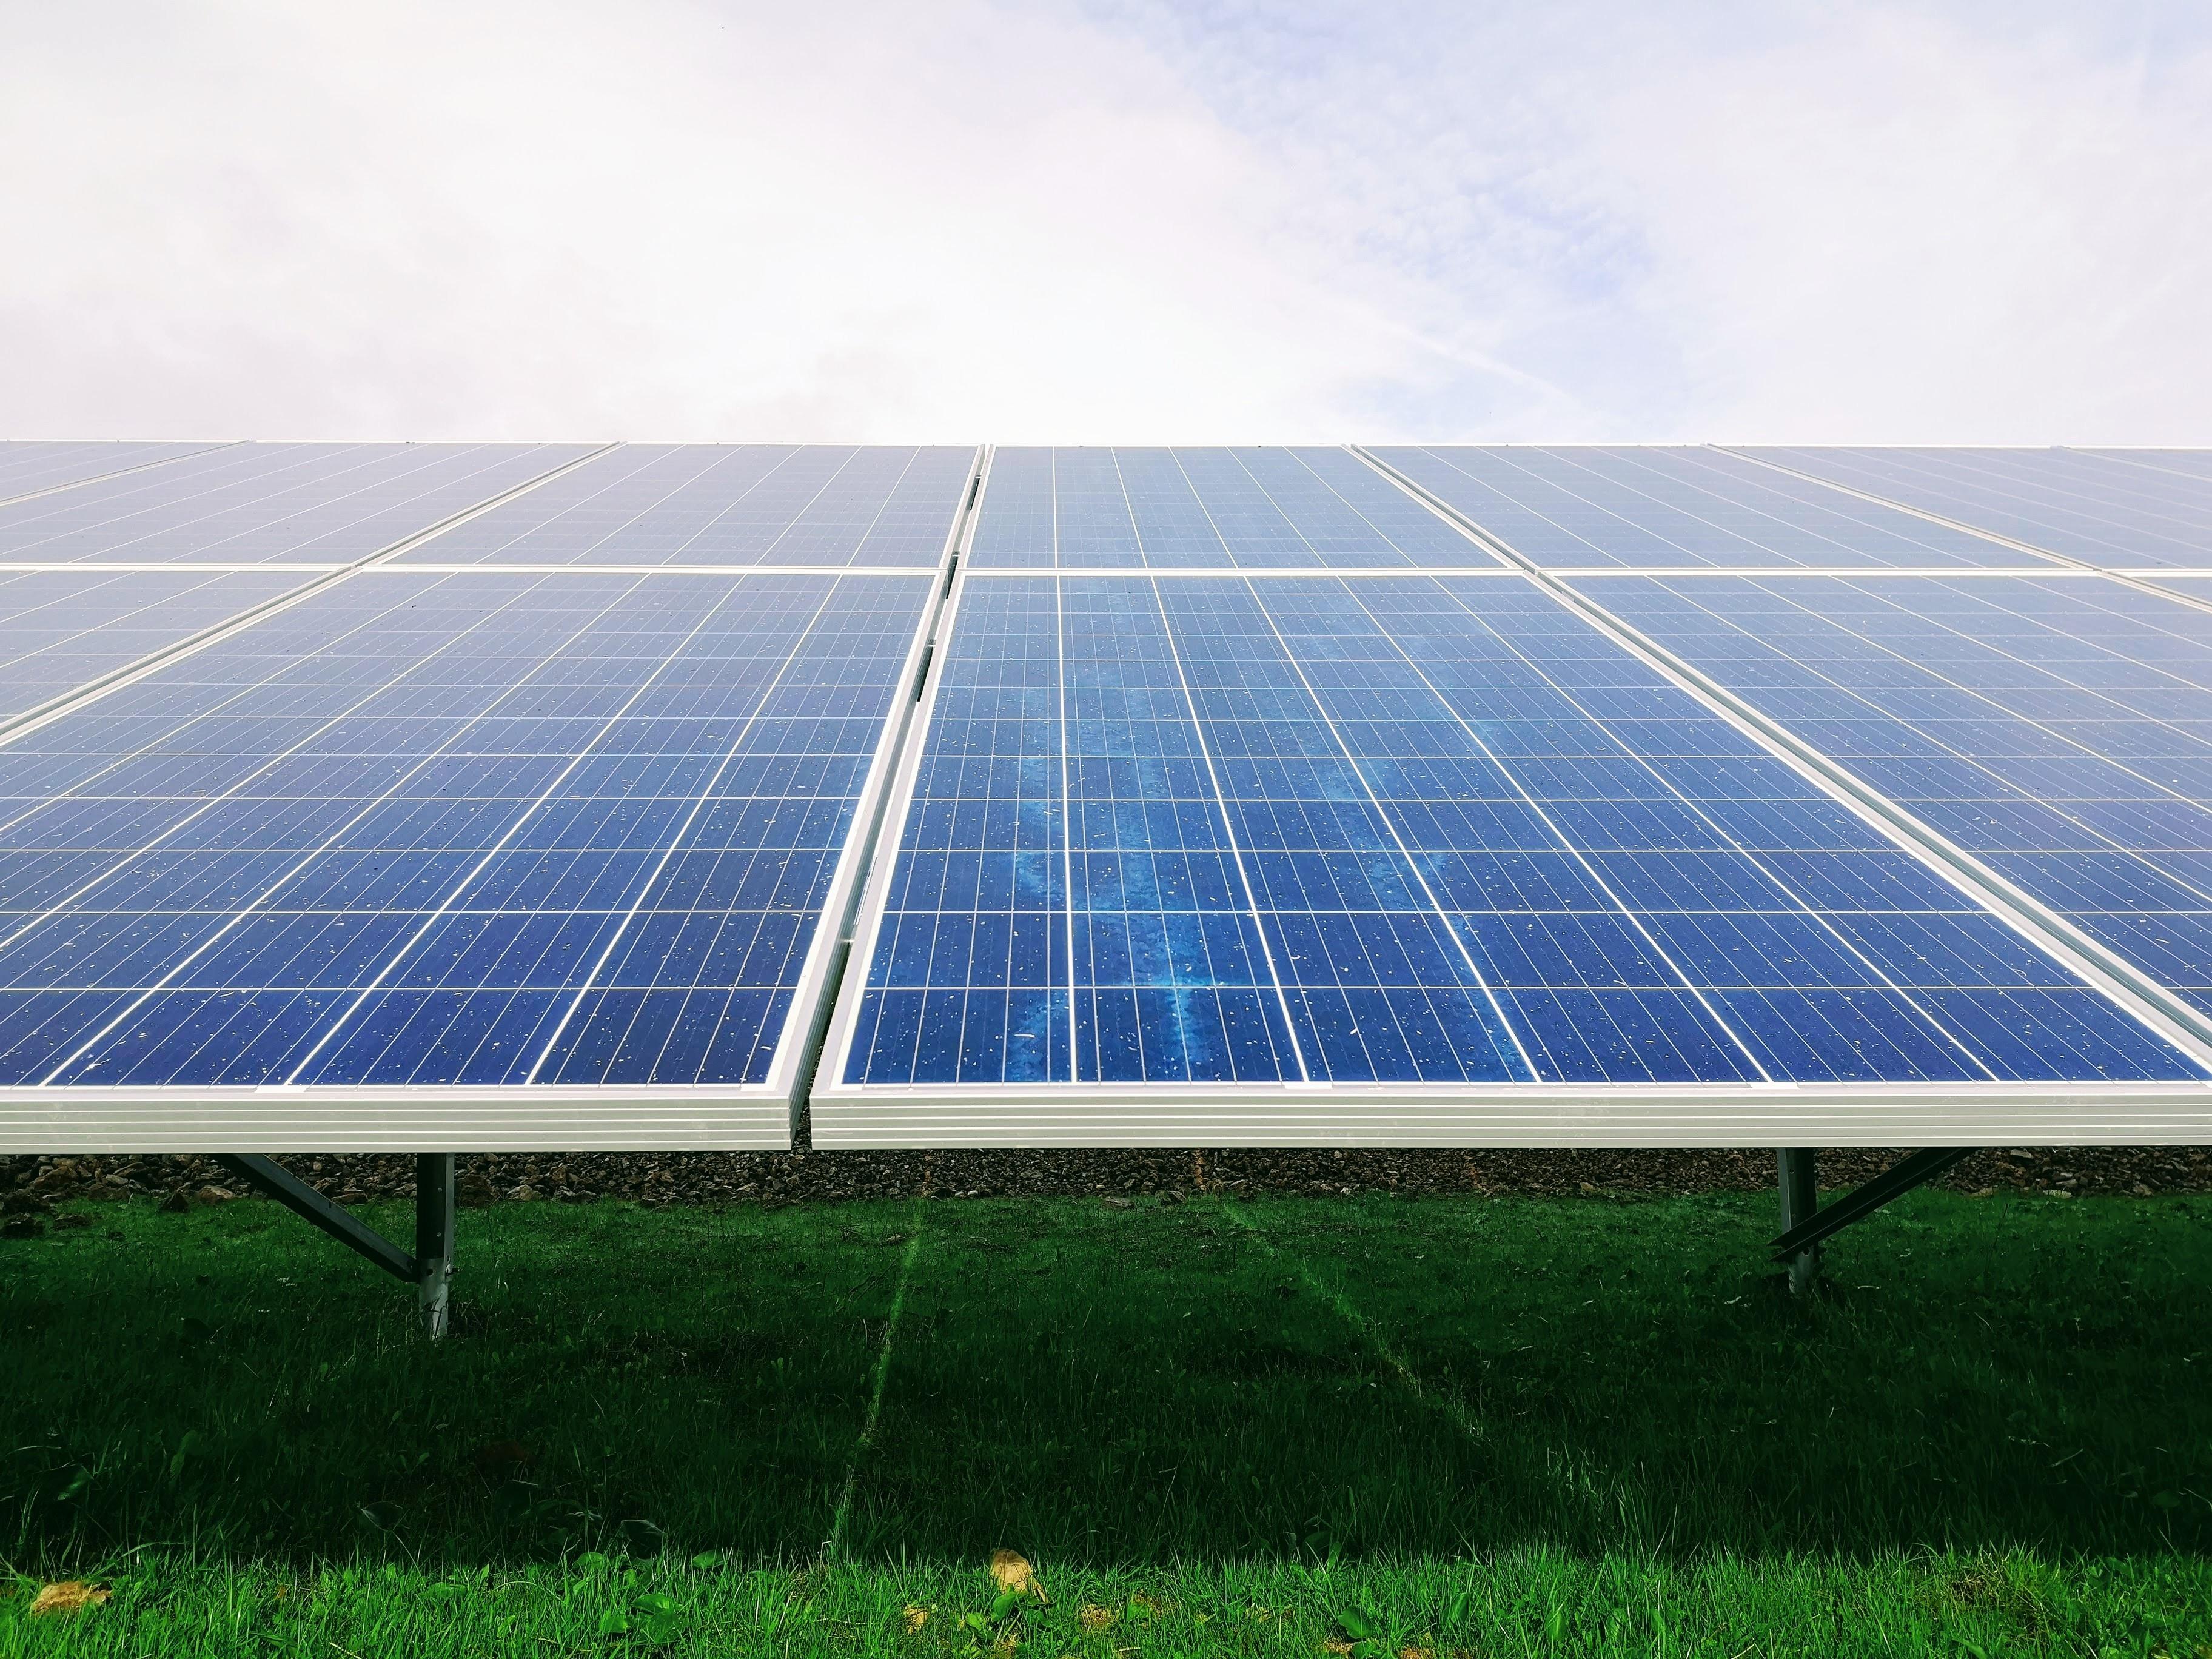 Blue solar panels sitting on grass